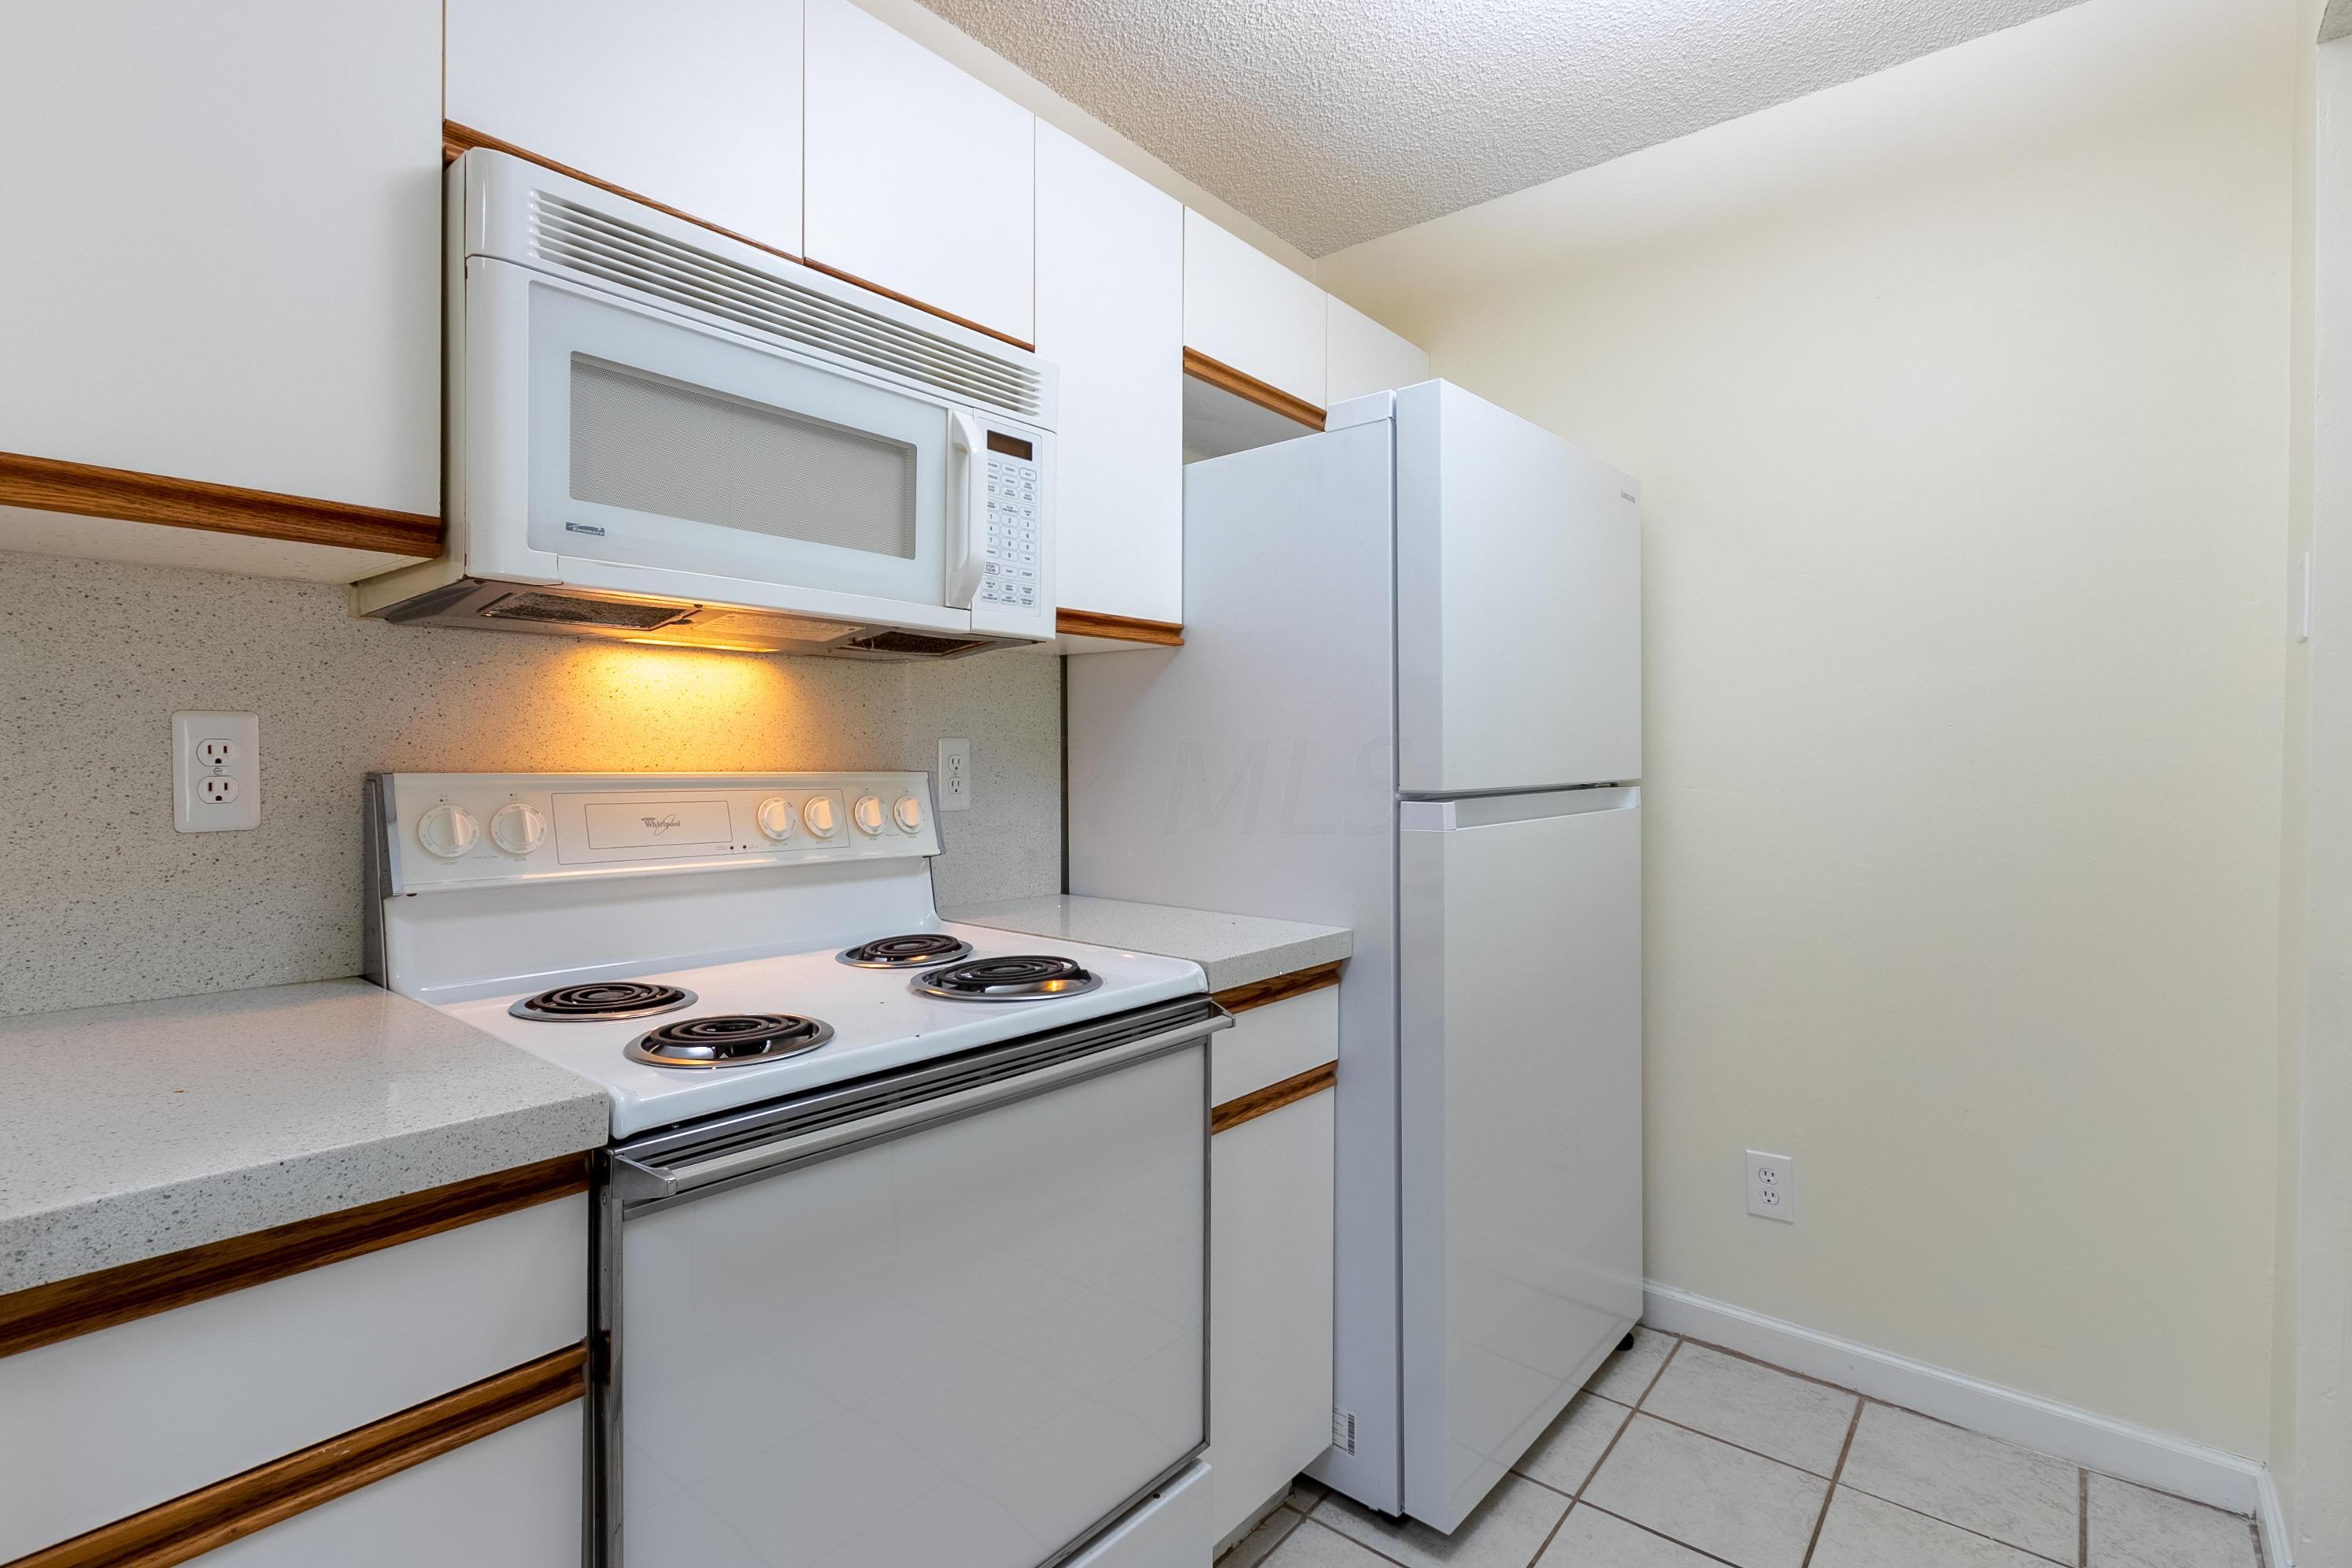 5522 Valencia Park Boulevard, Hilliard, Ohio 43026, 2 Bedrooms Bedrooms, ,3 BathroomsBathrooms,Residential,For Sale,Valencia Park,220040331